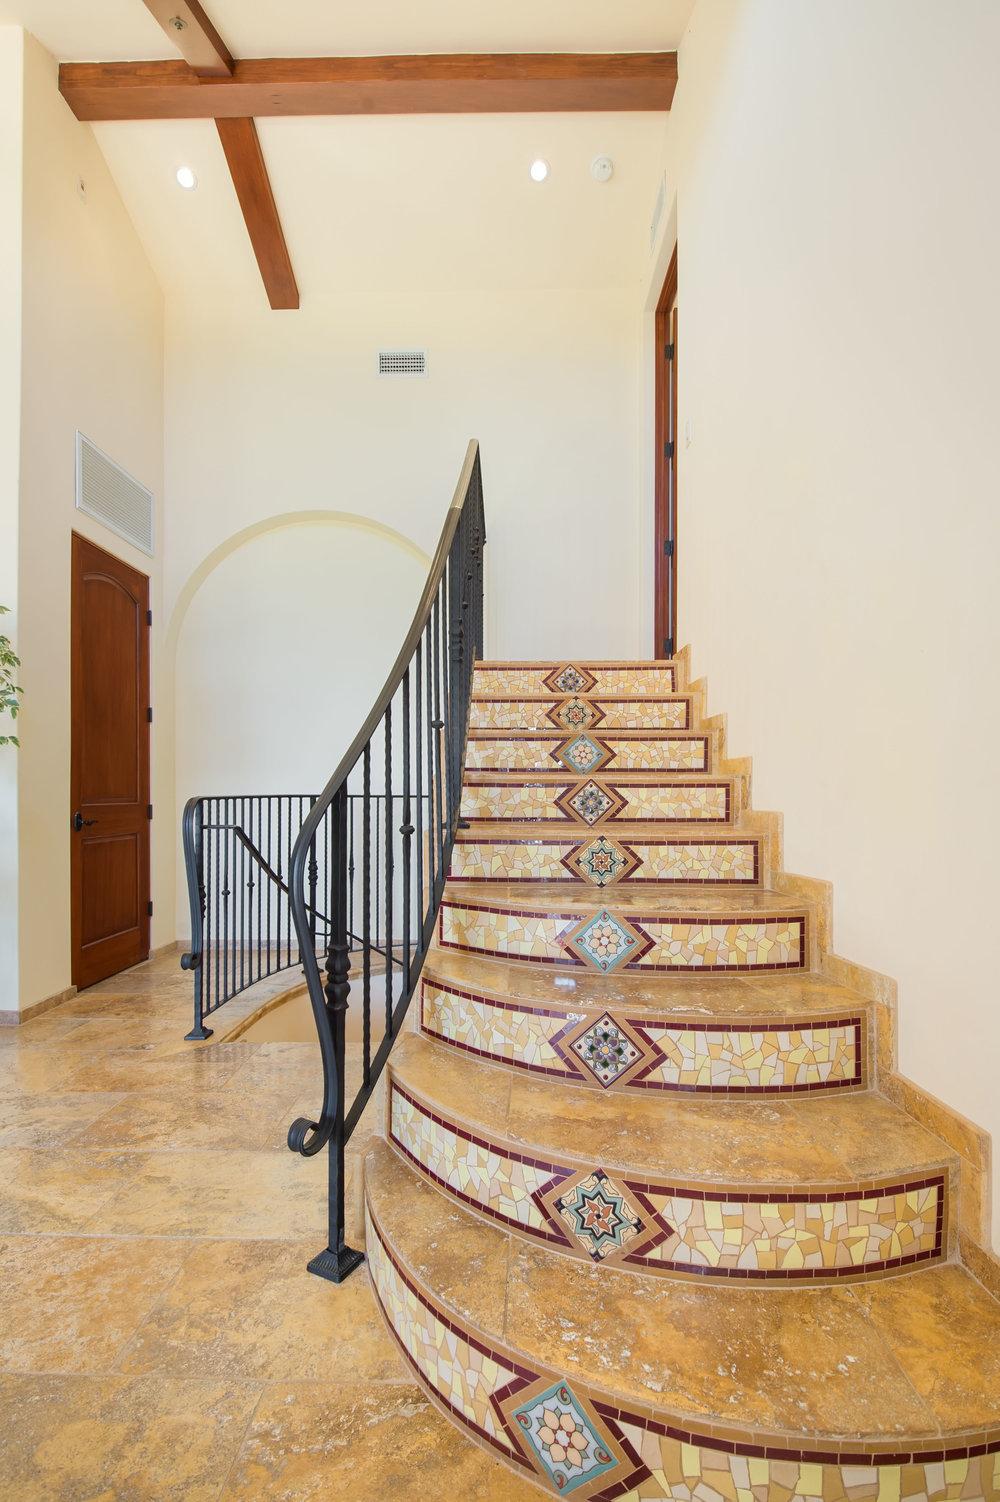 022.1 Stairs 26303 Lockwood Road Malibu For Sale Lease The Malibu Life Team Luxury Real Estate.jpg